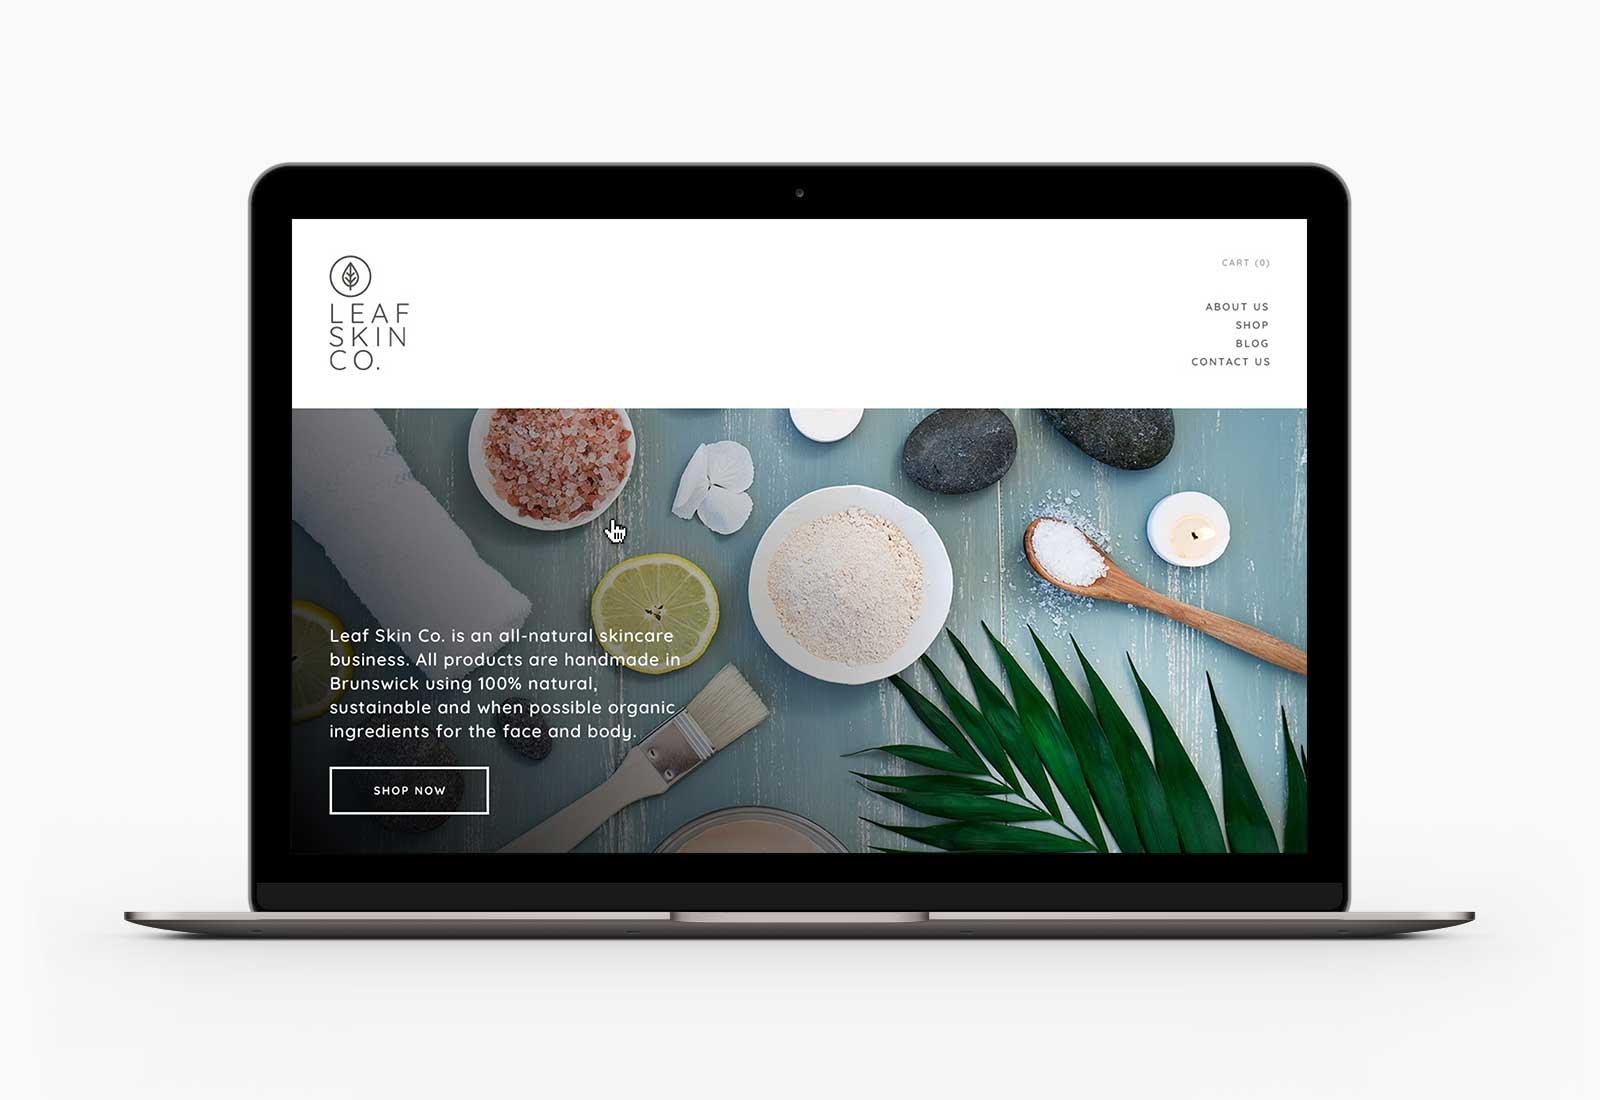 Leaf Skin Co. homepage desktop design on Macbook